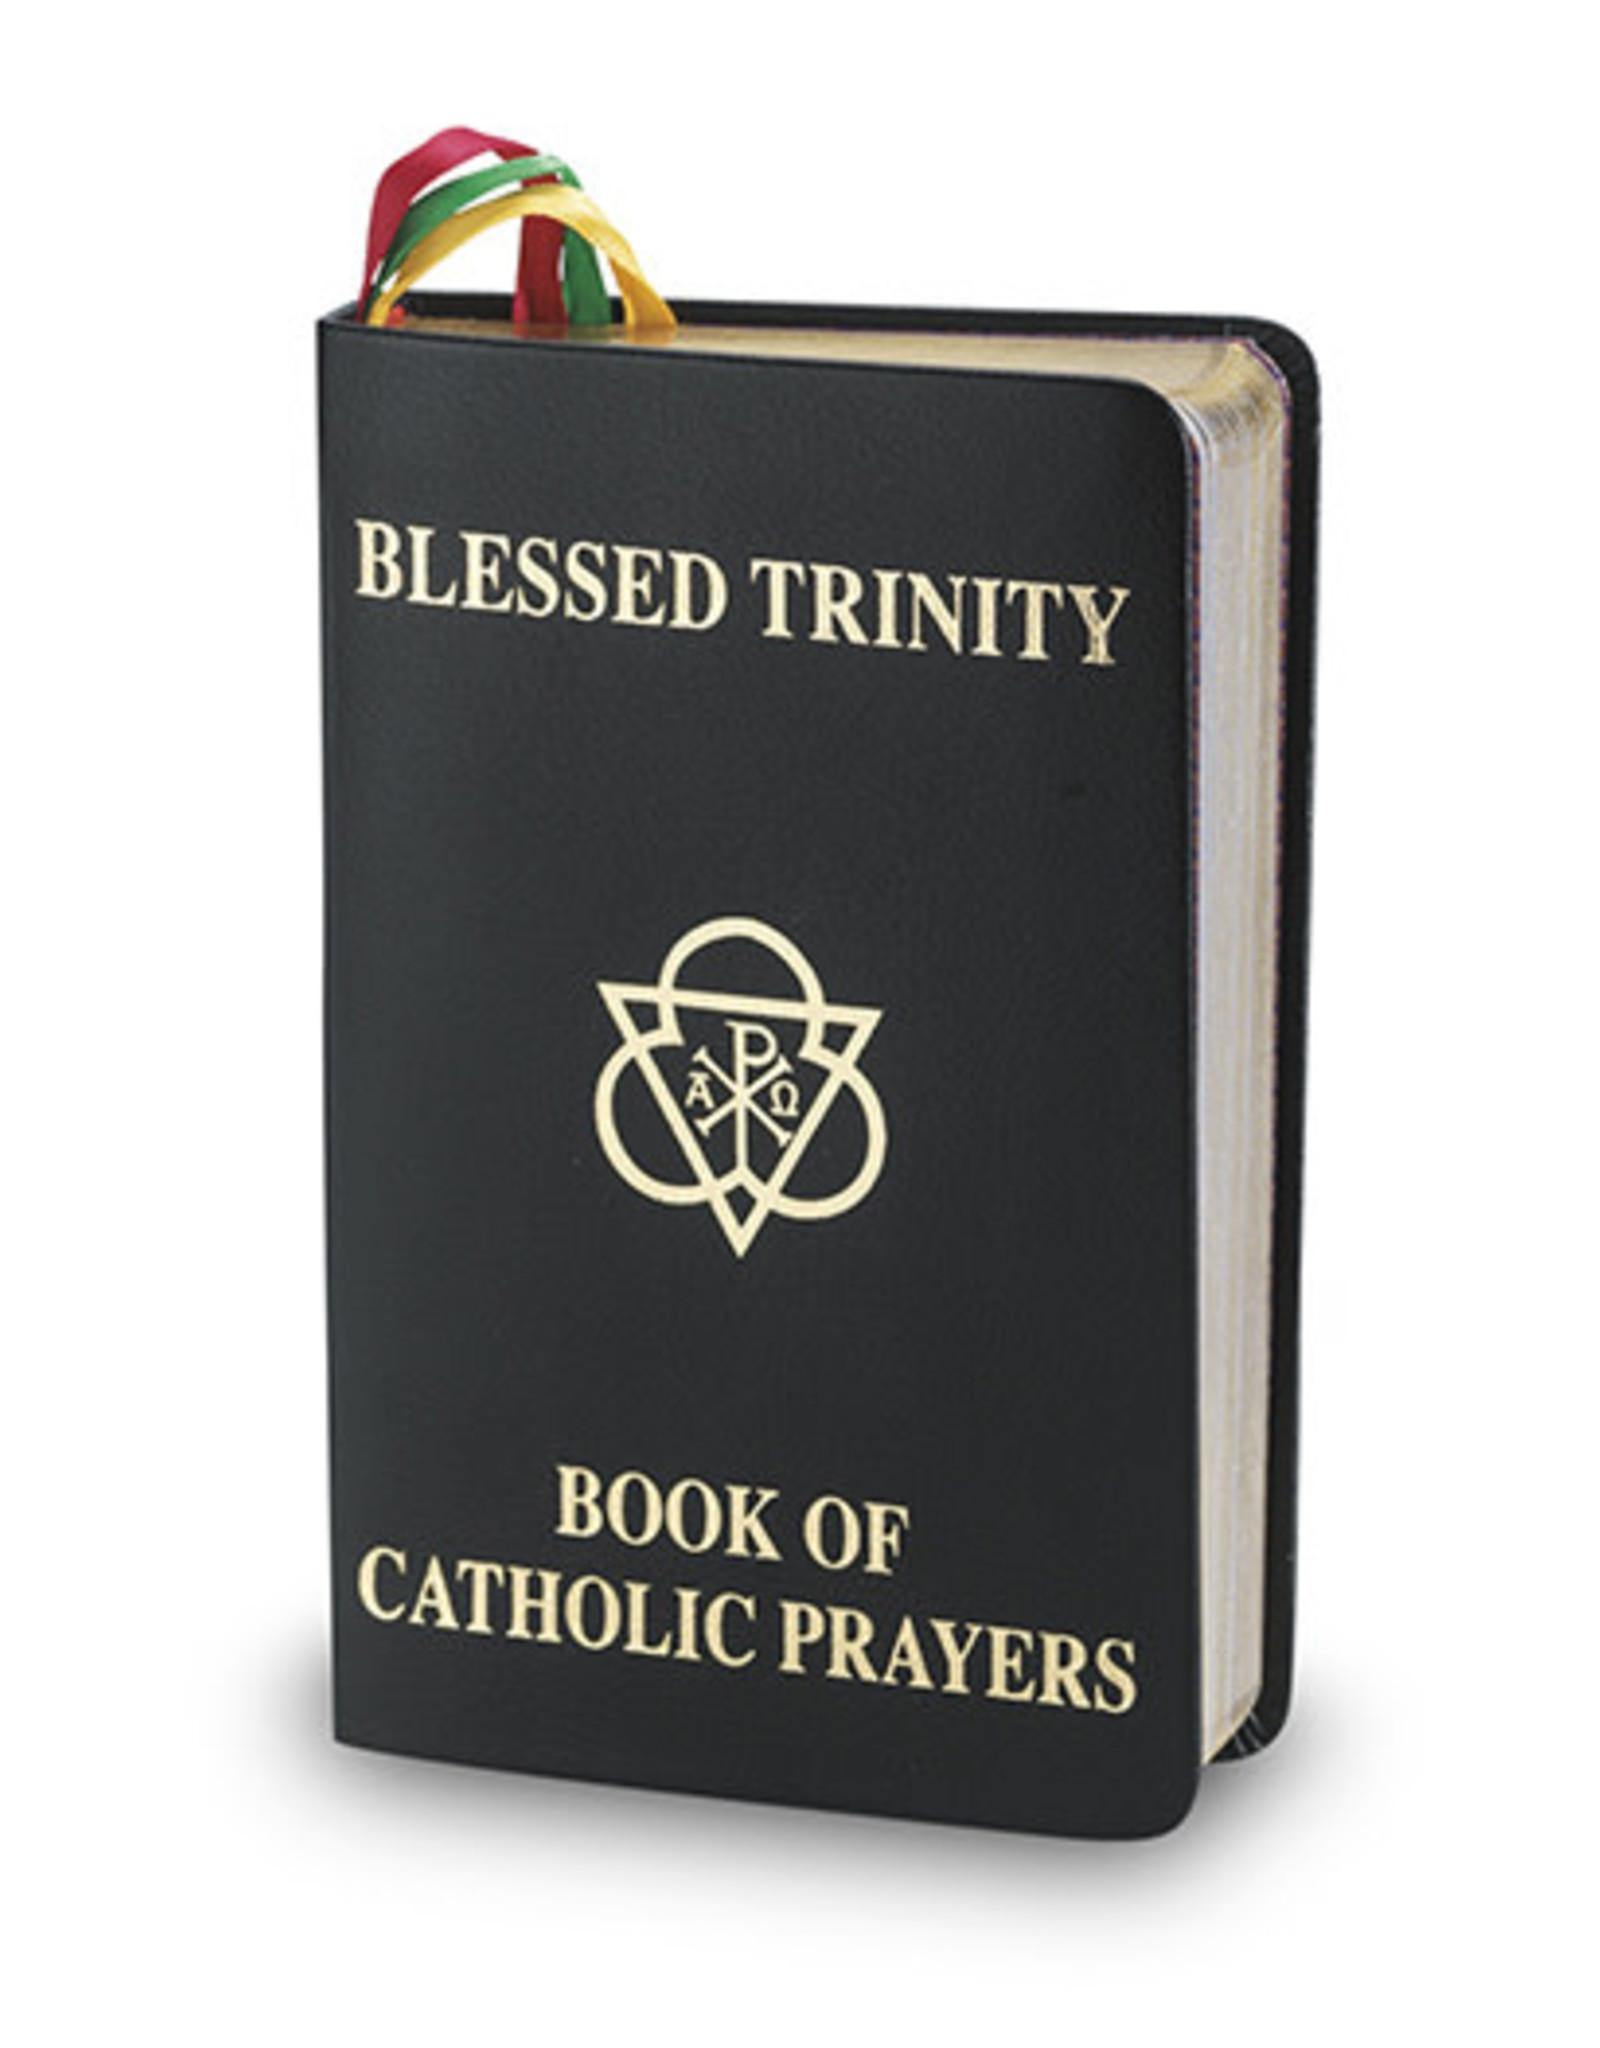 Blessed Trinity Book of Catholic Prayers